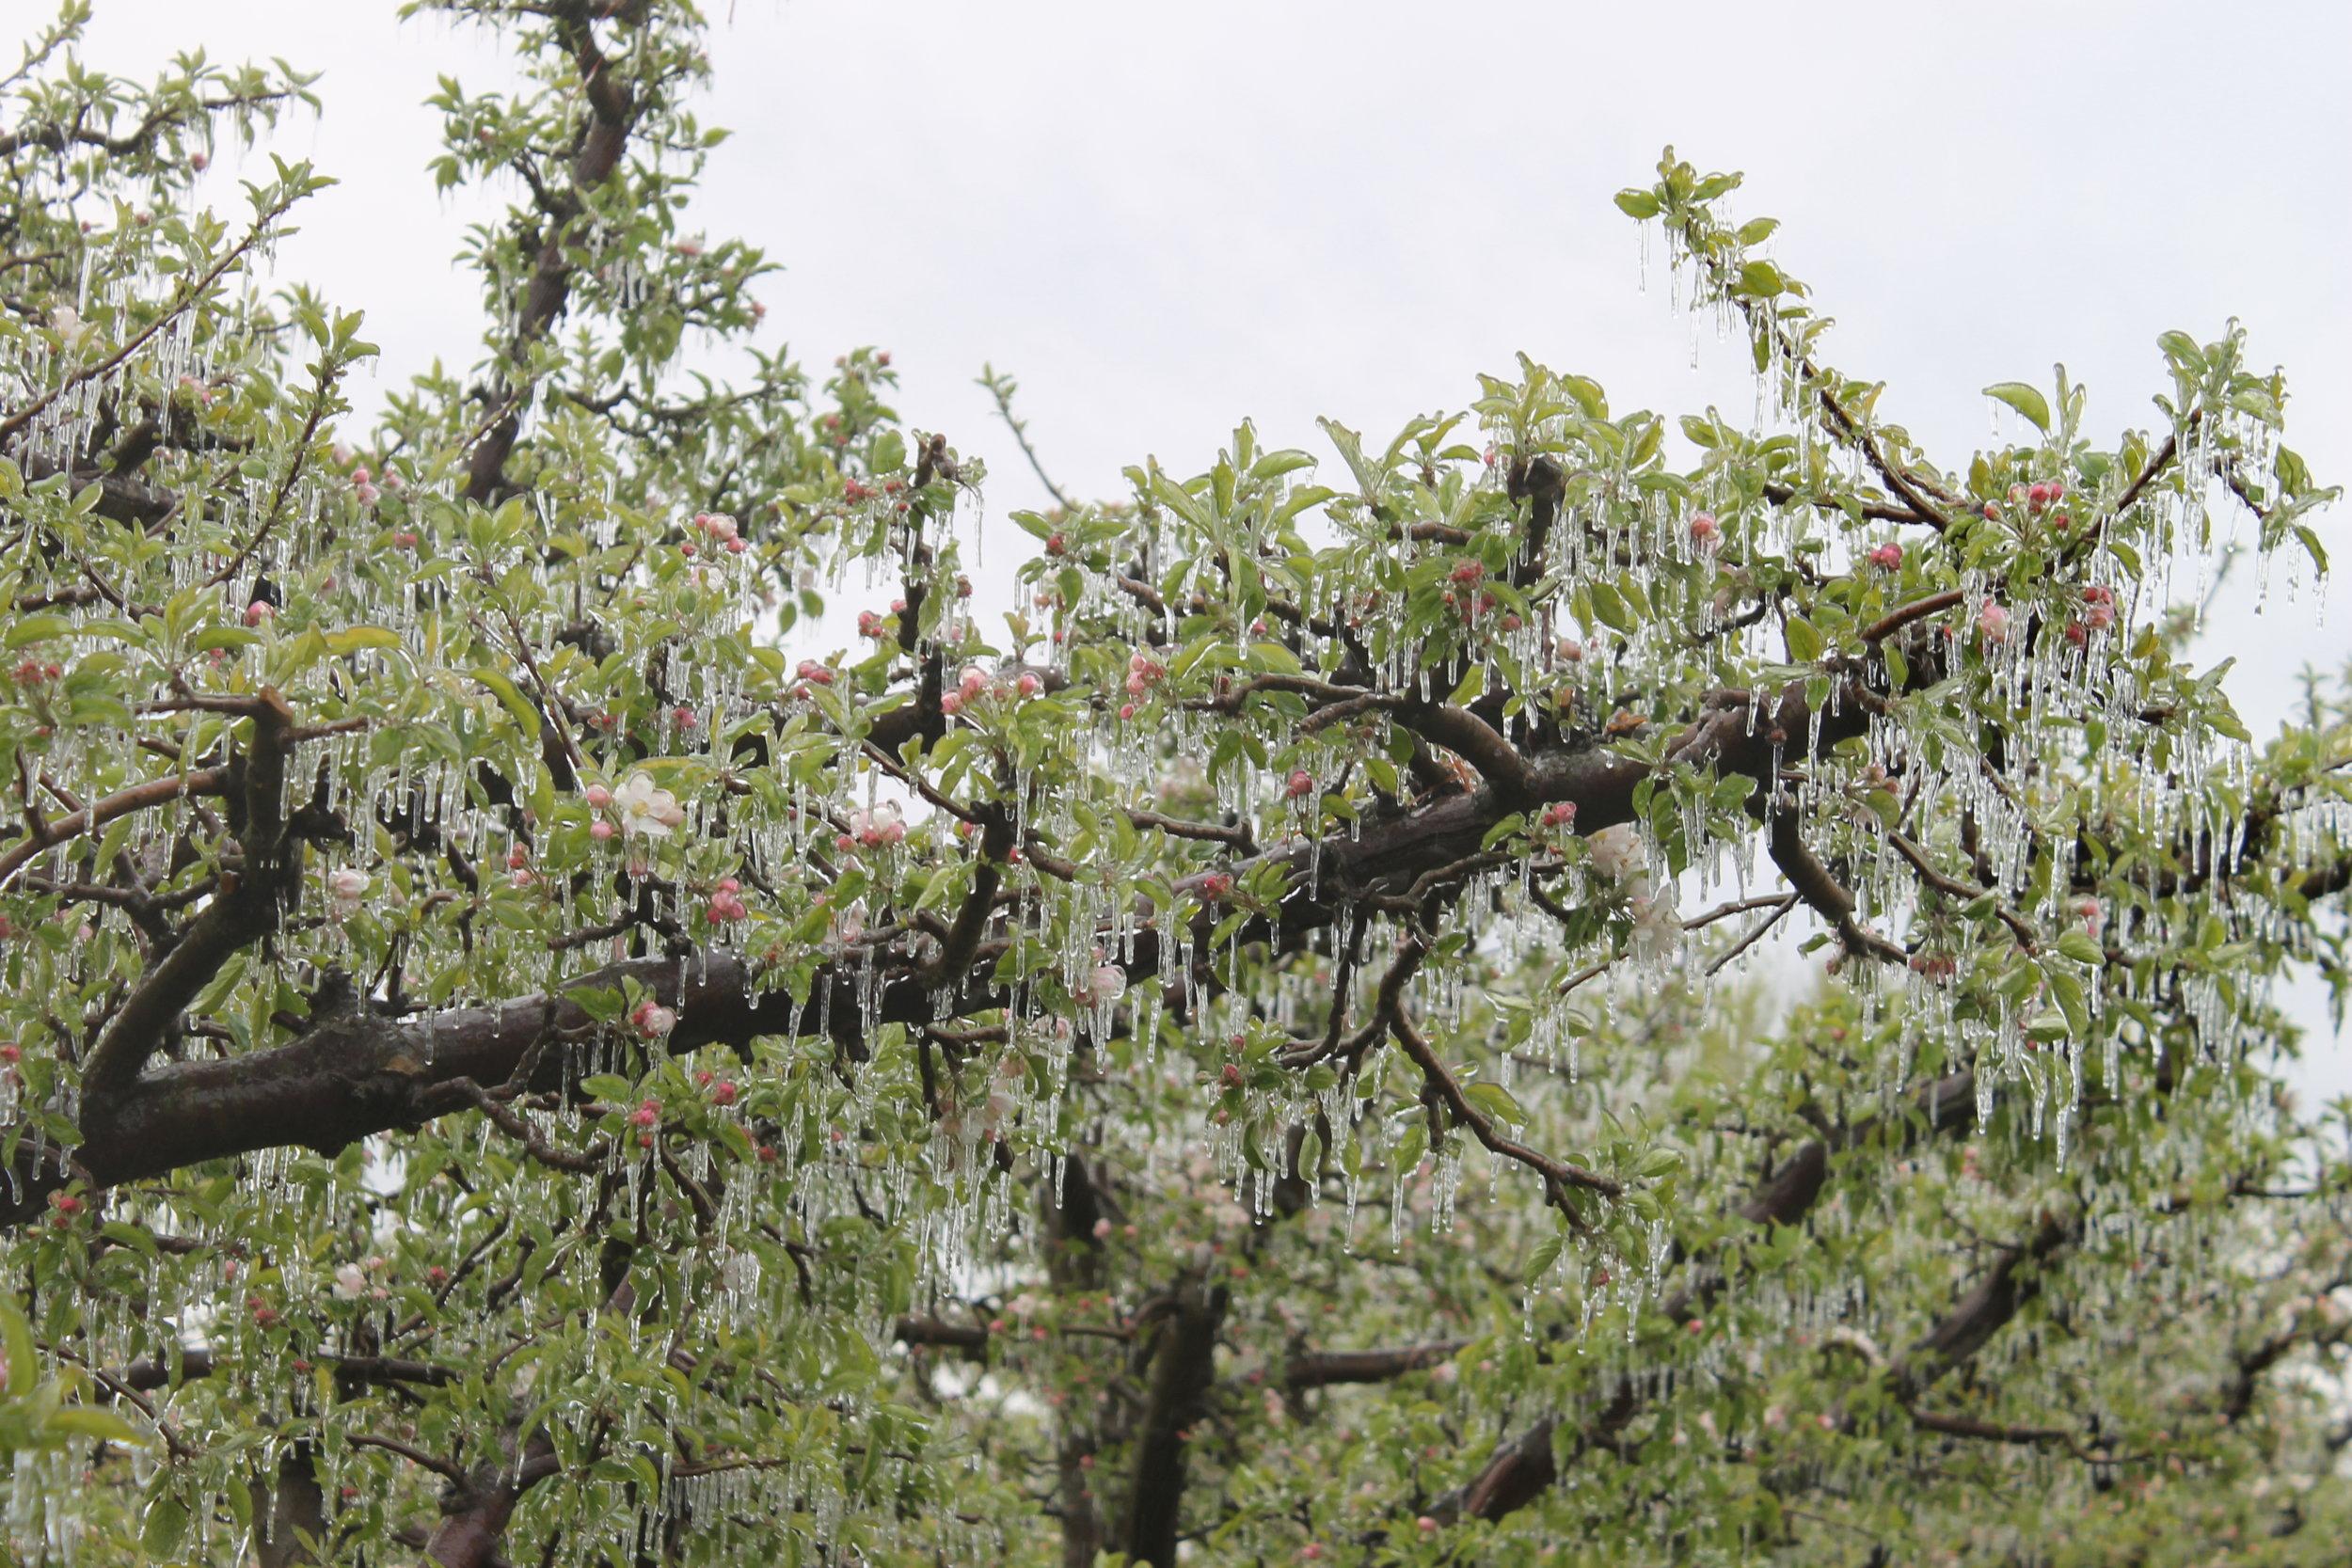 2015-04-04 Frozen Orchard (1).jpg